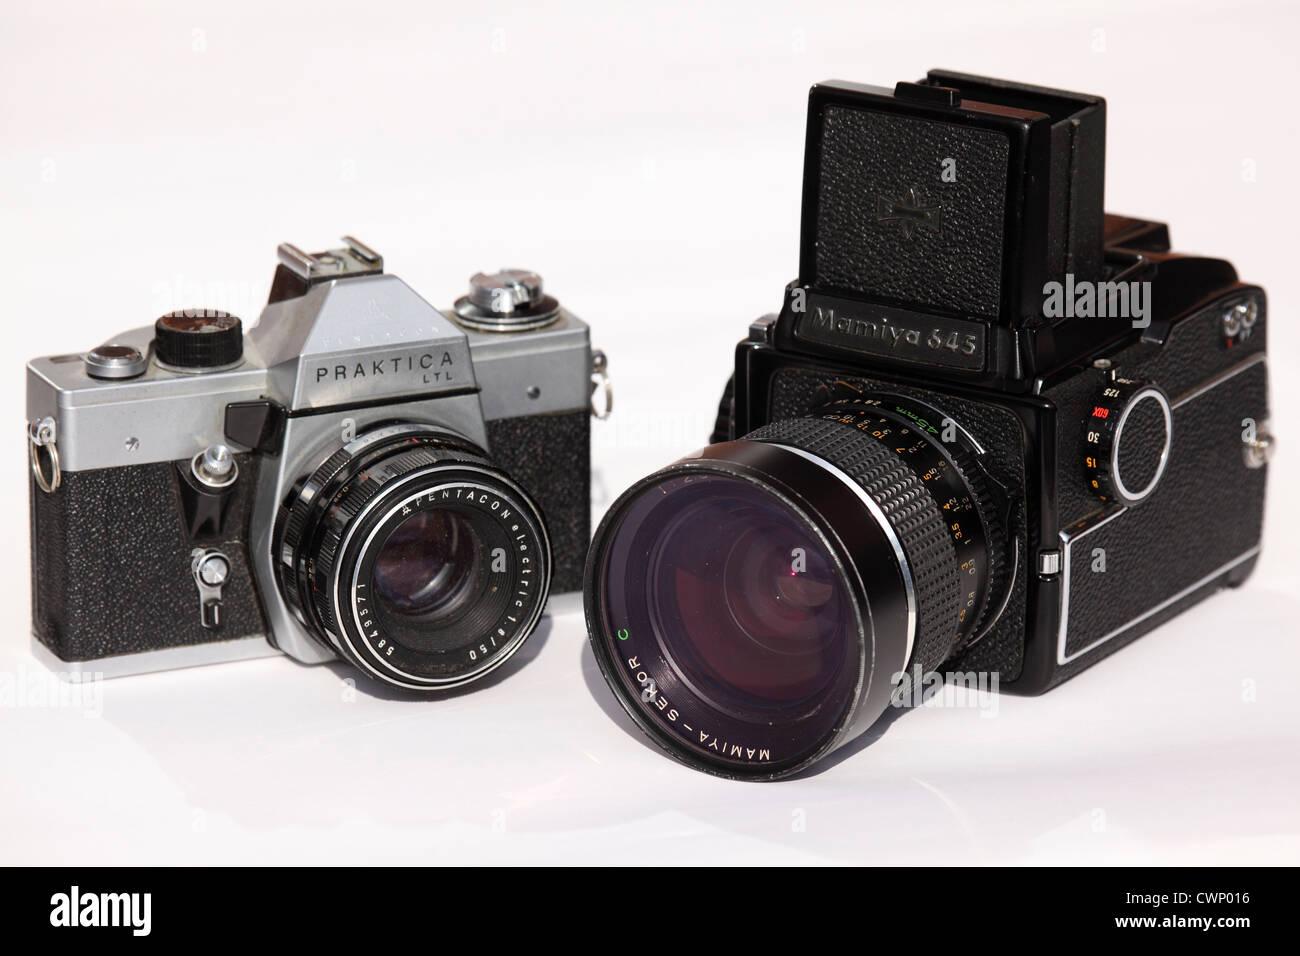 James s camera collection praktica ltl